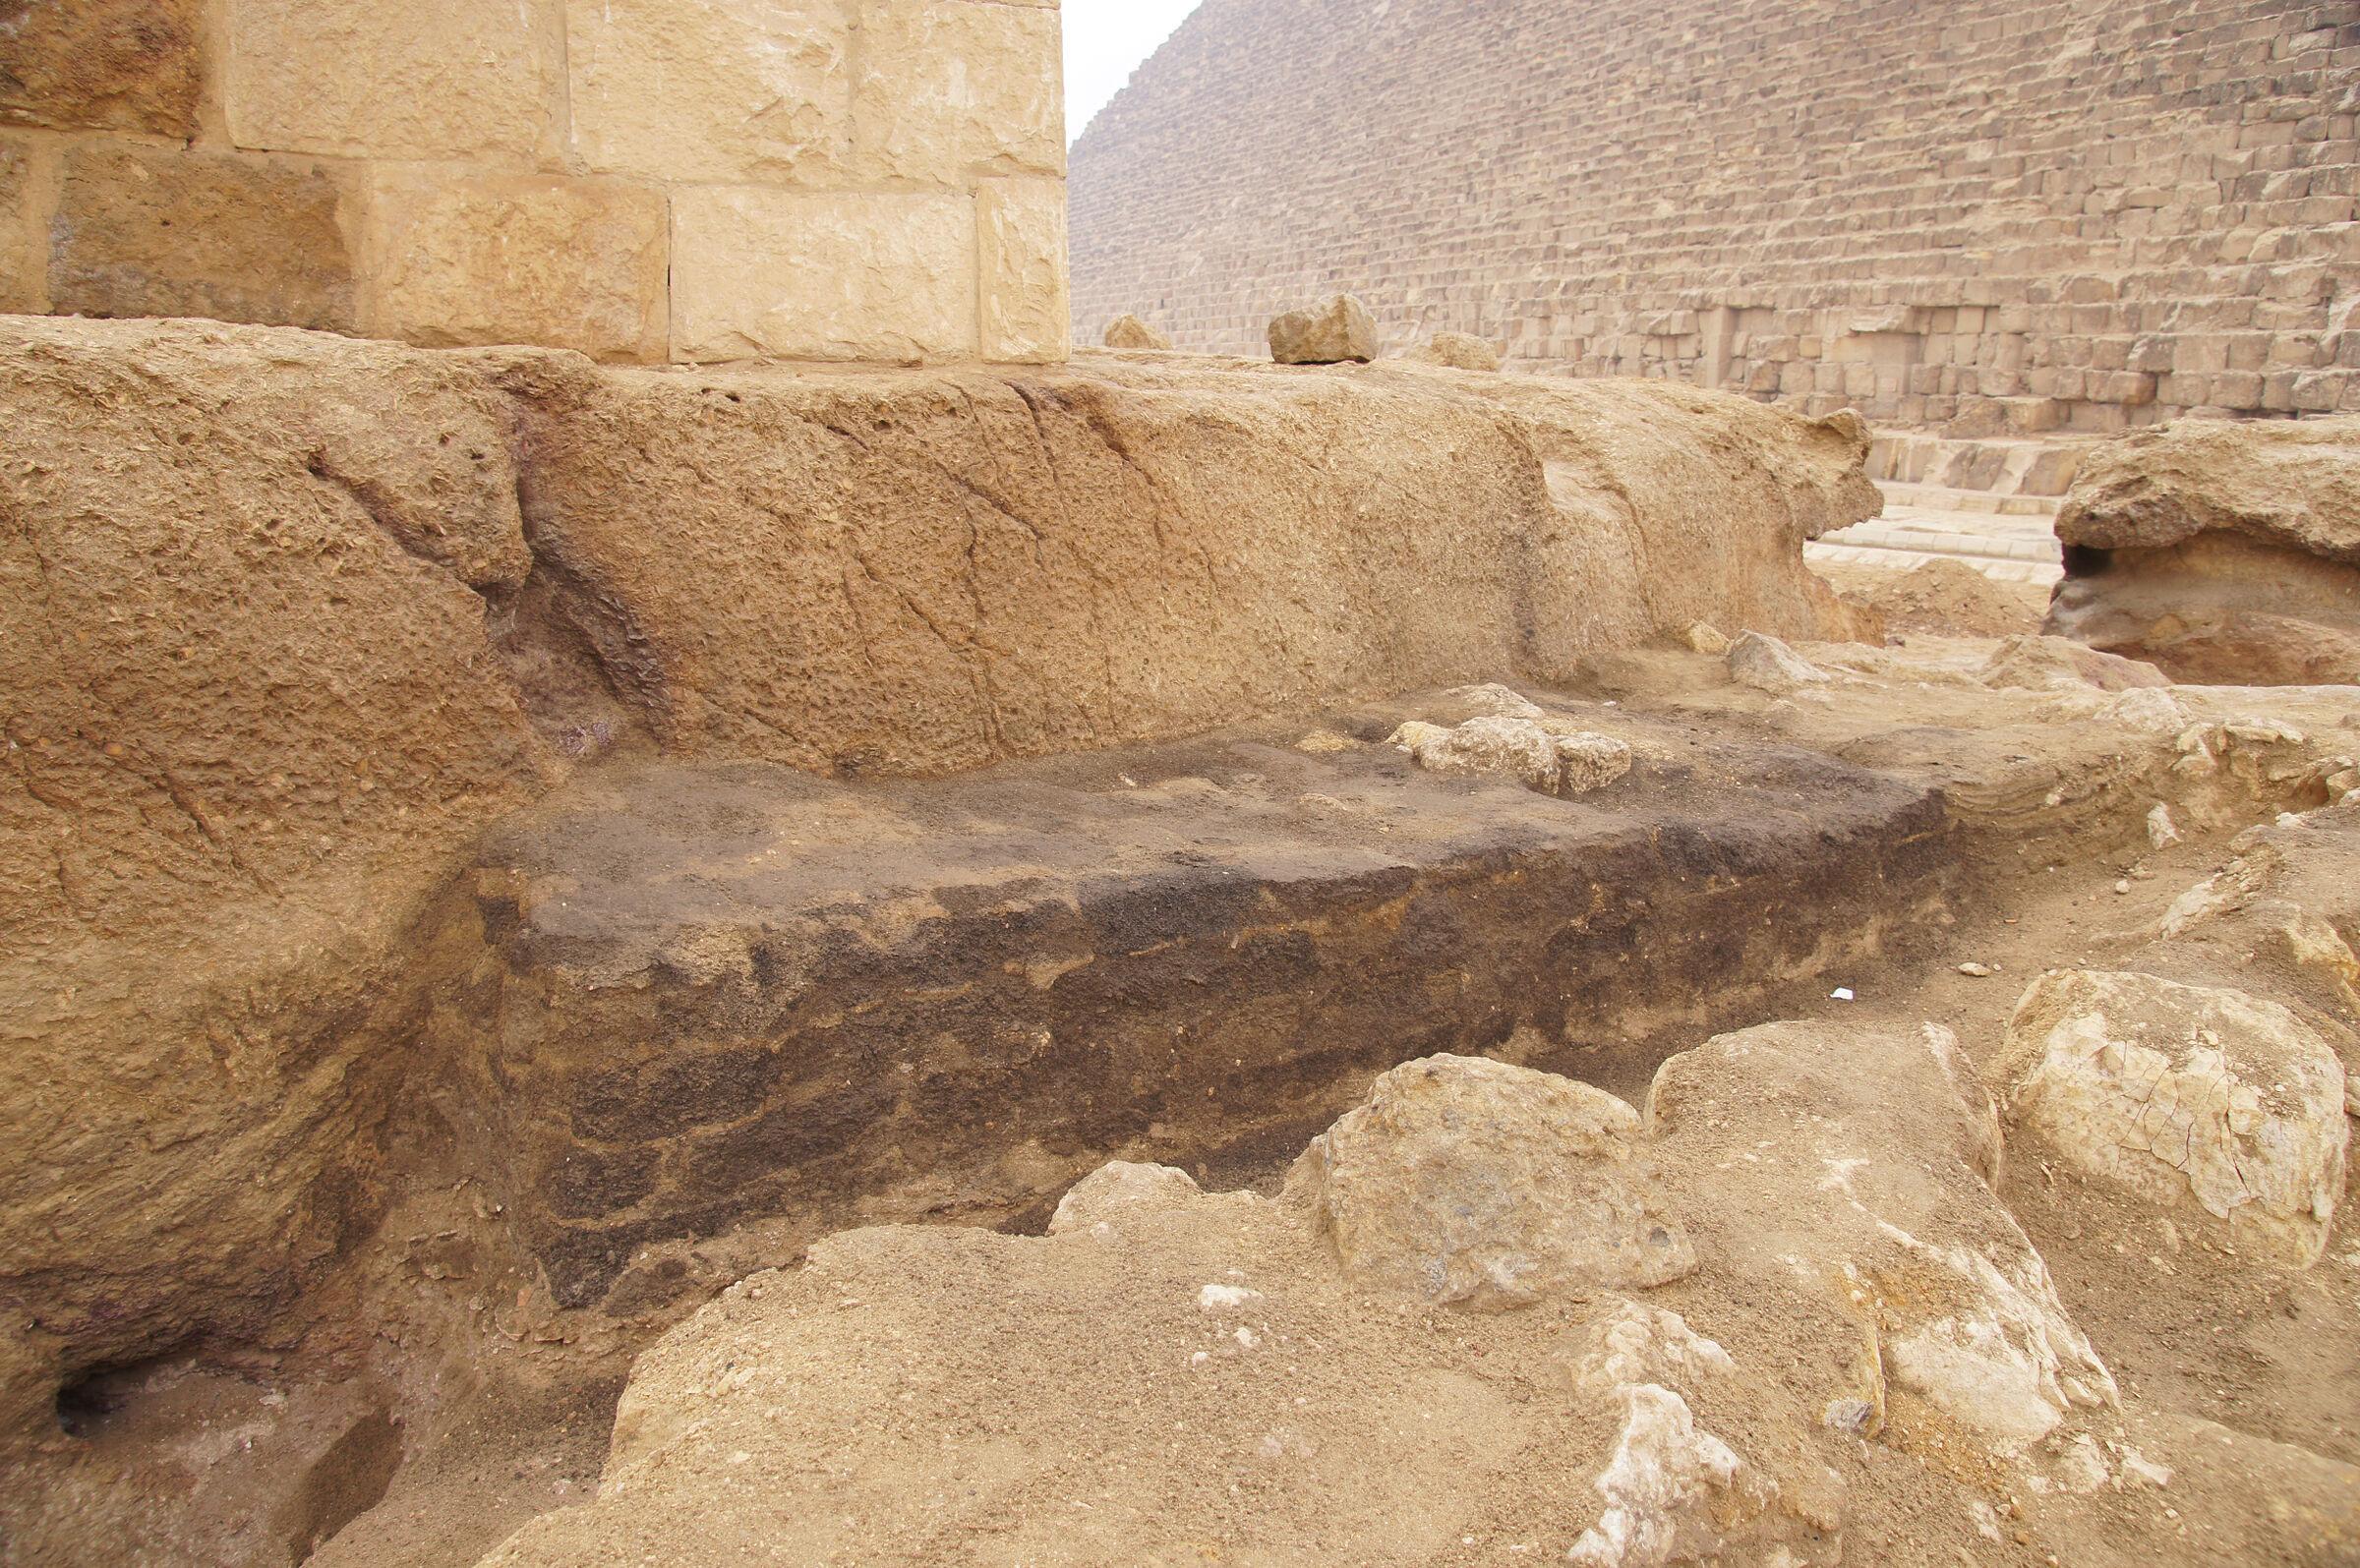 Khufu Pyramid Complex, Western Cemetery: Site: Giza; View: G 5411, Khufu Pyramid